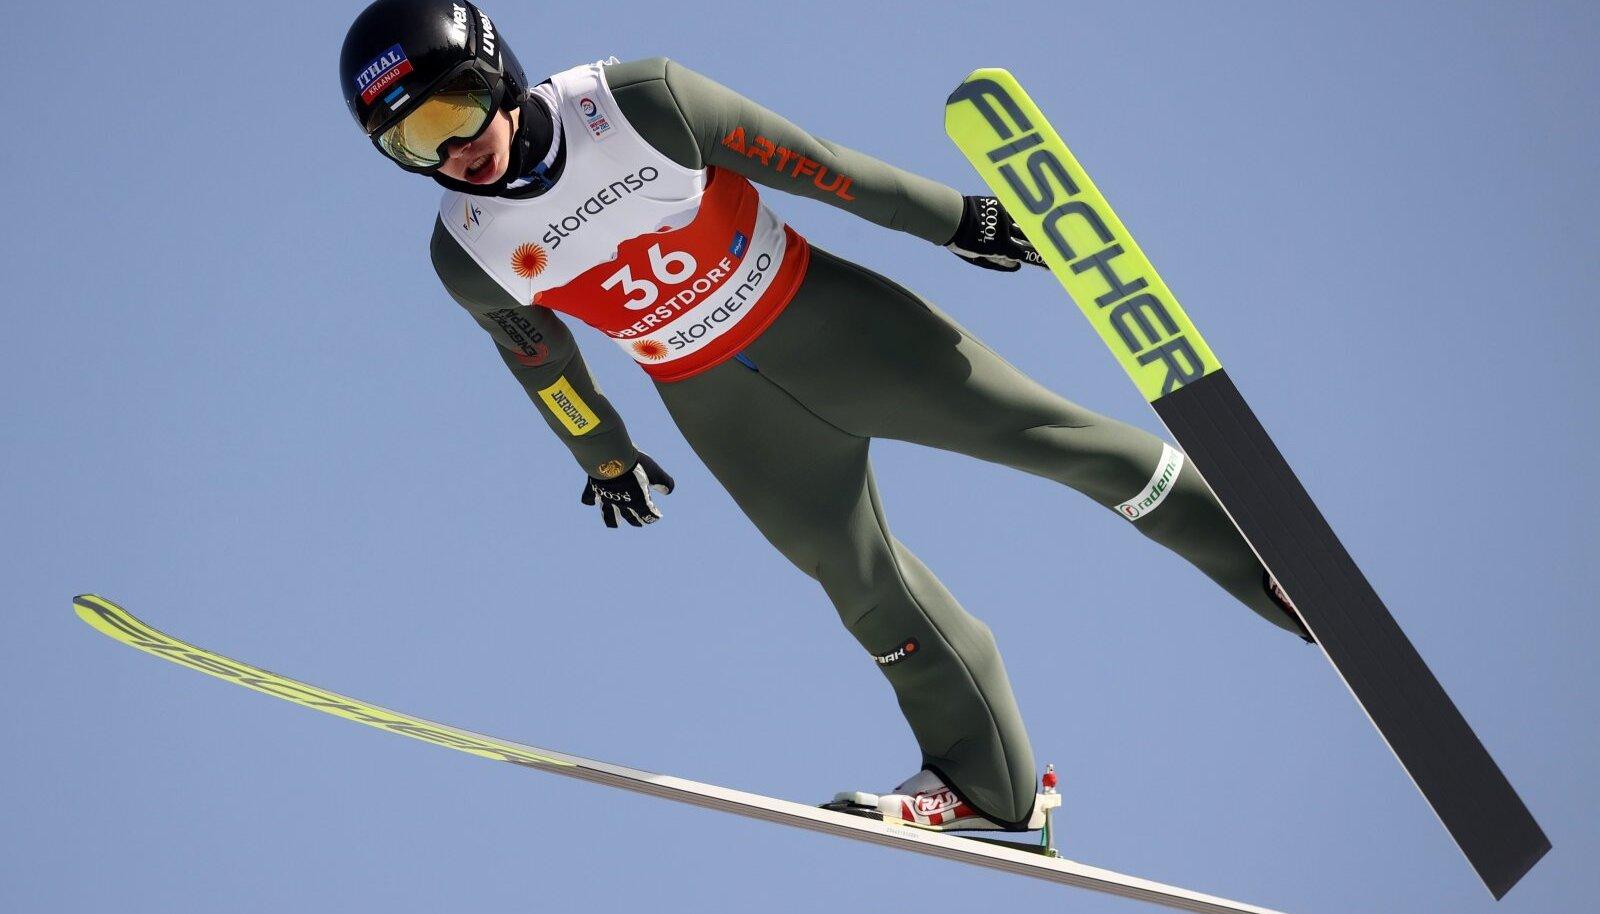 FIS Nordic World Ski Championships